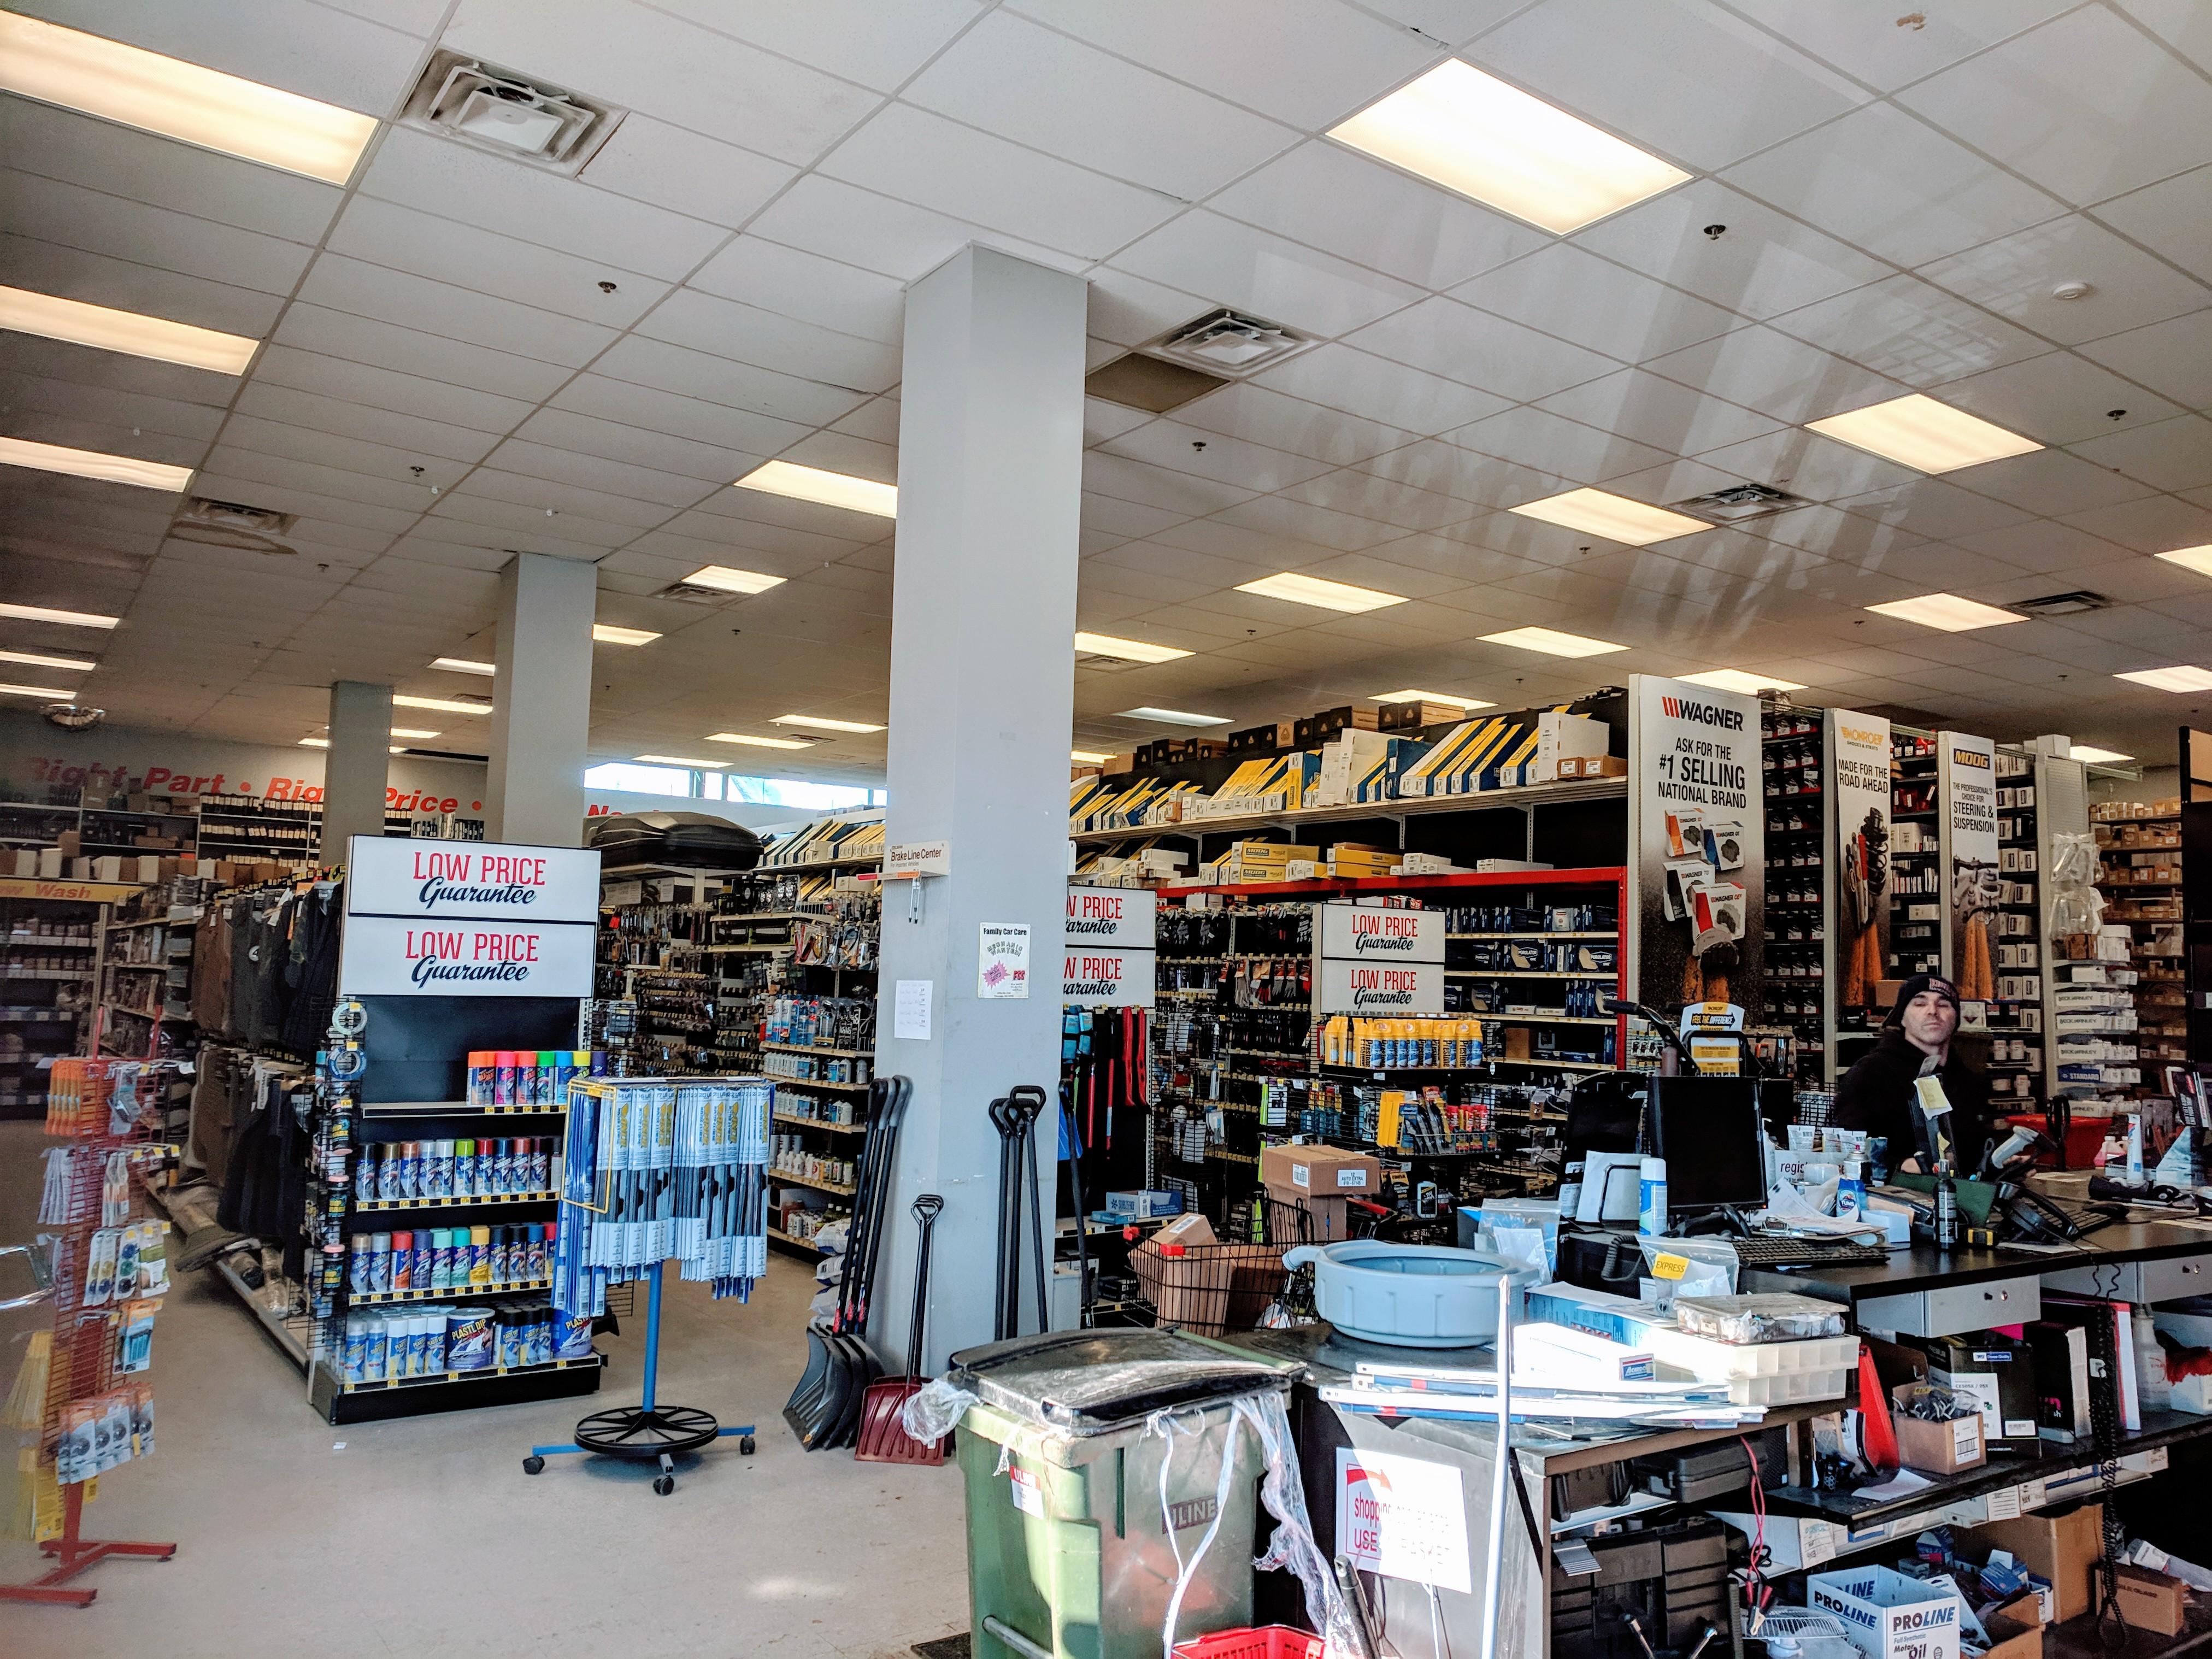 interior auto parts store_Gloucester MA_20190219_© catherine ryan.jpg